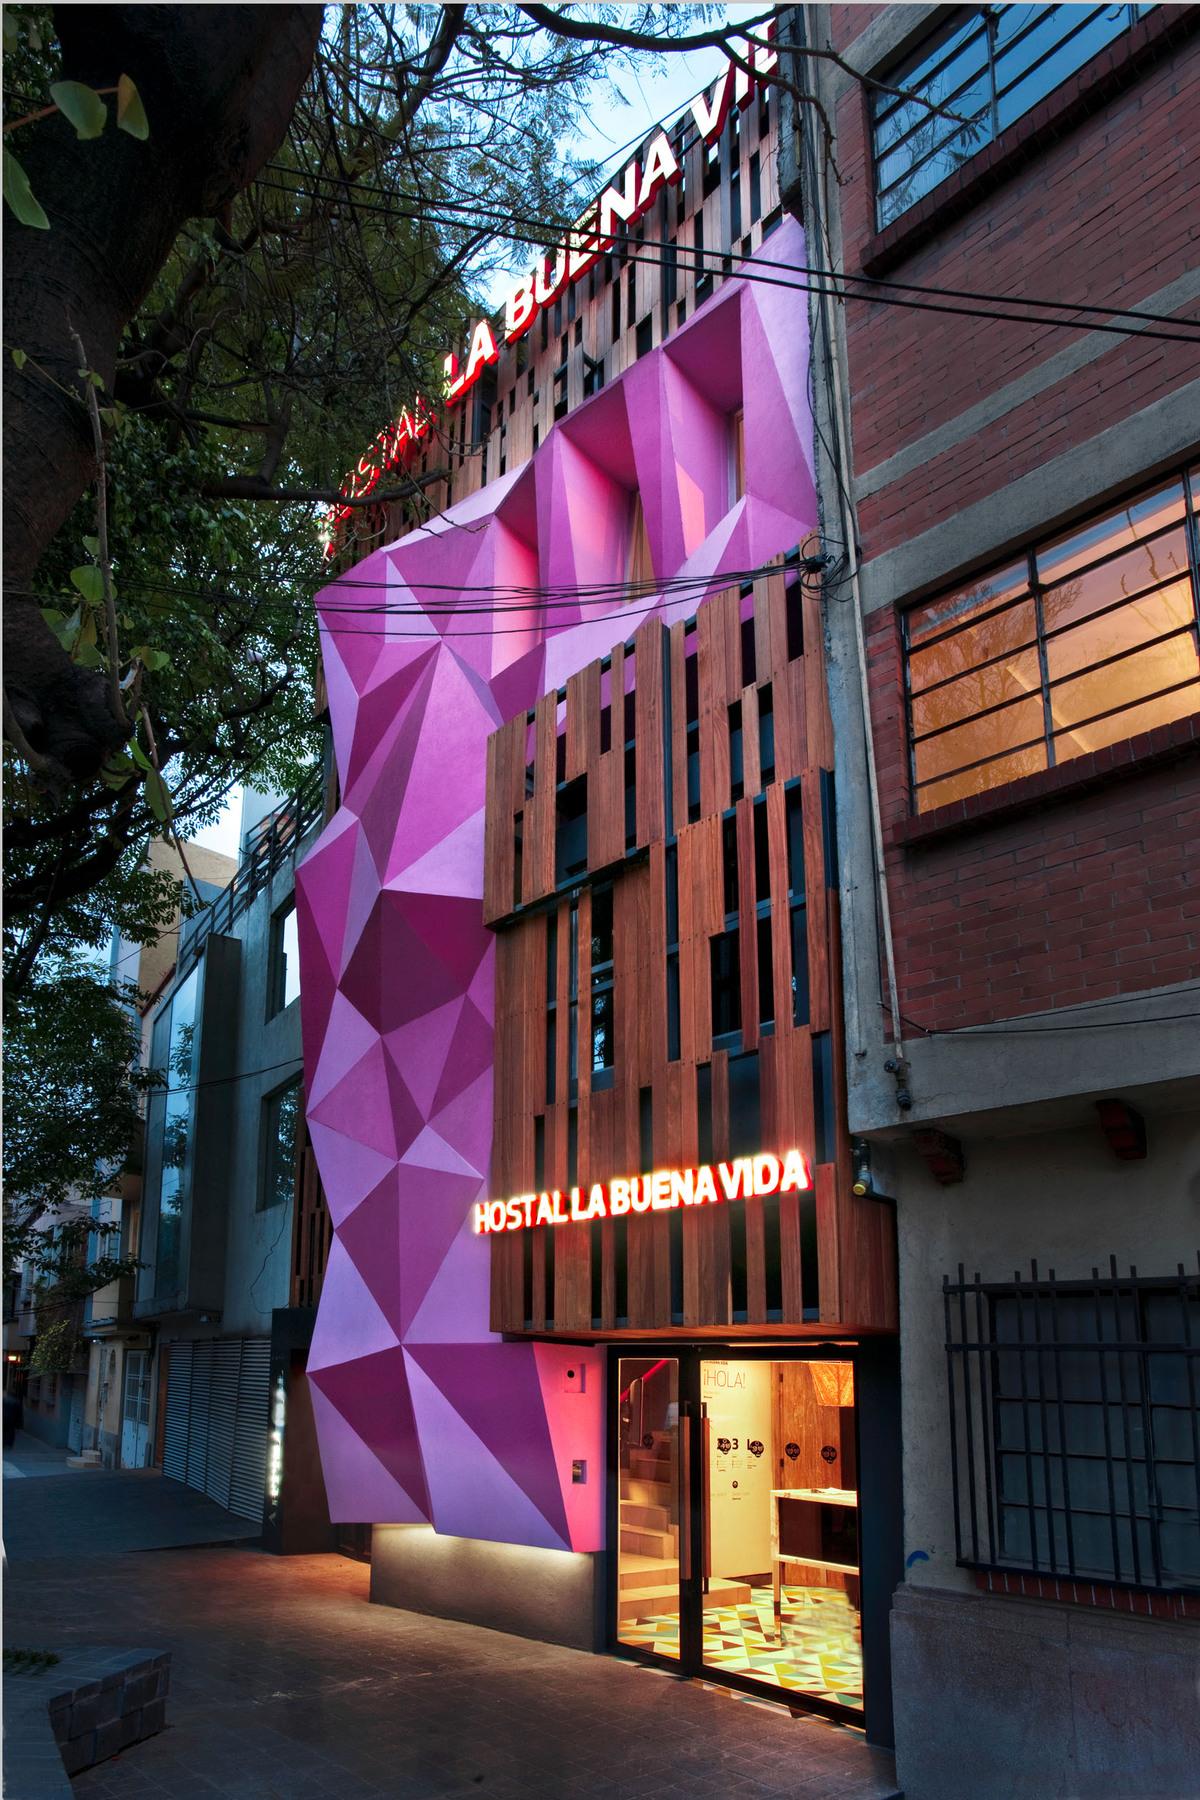 Hostal la buena vida arco arquitectura contempor nea for Arquitectura contemporanea